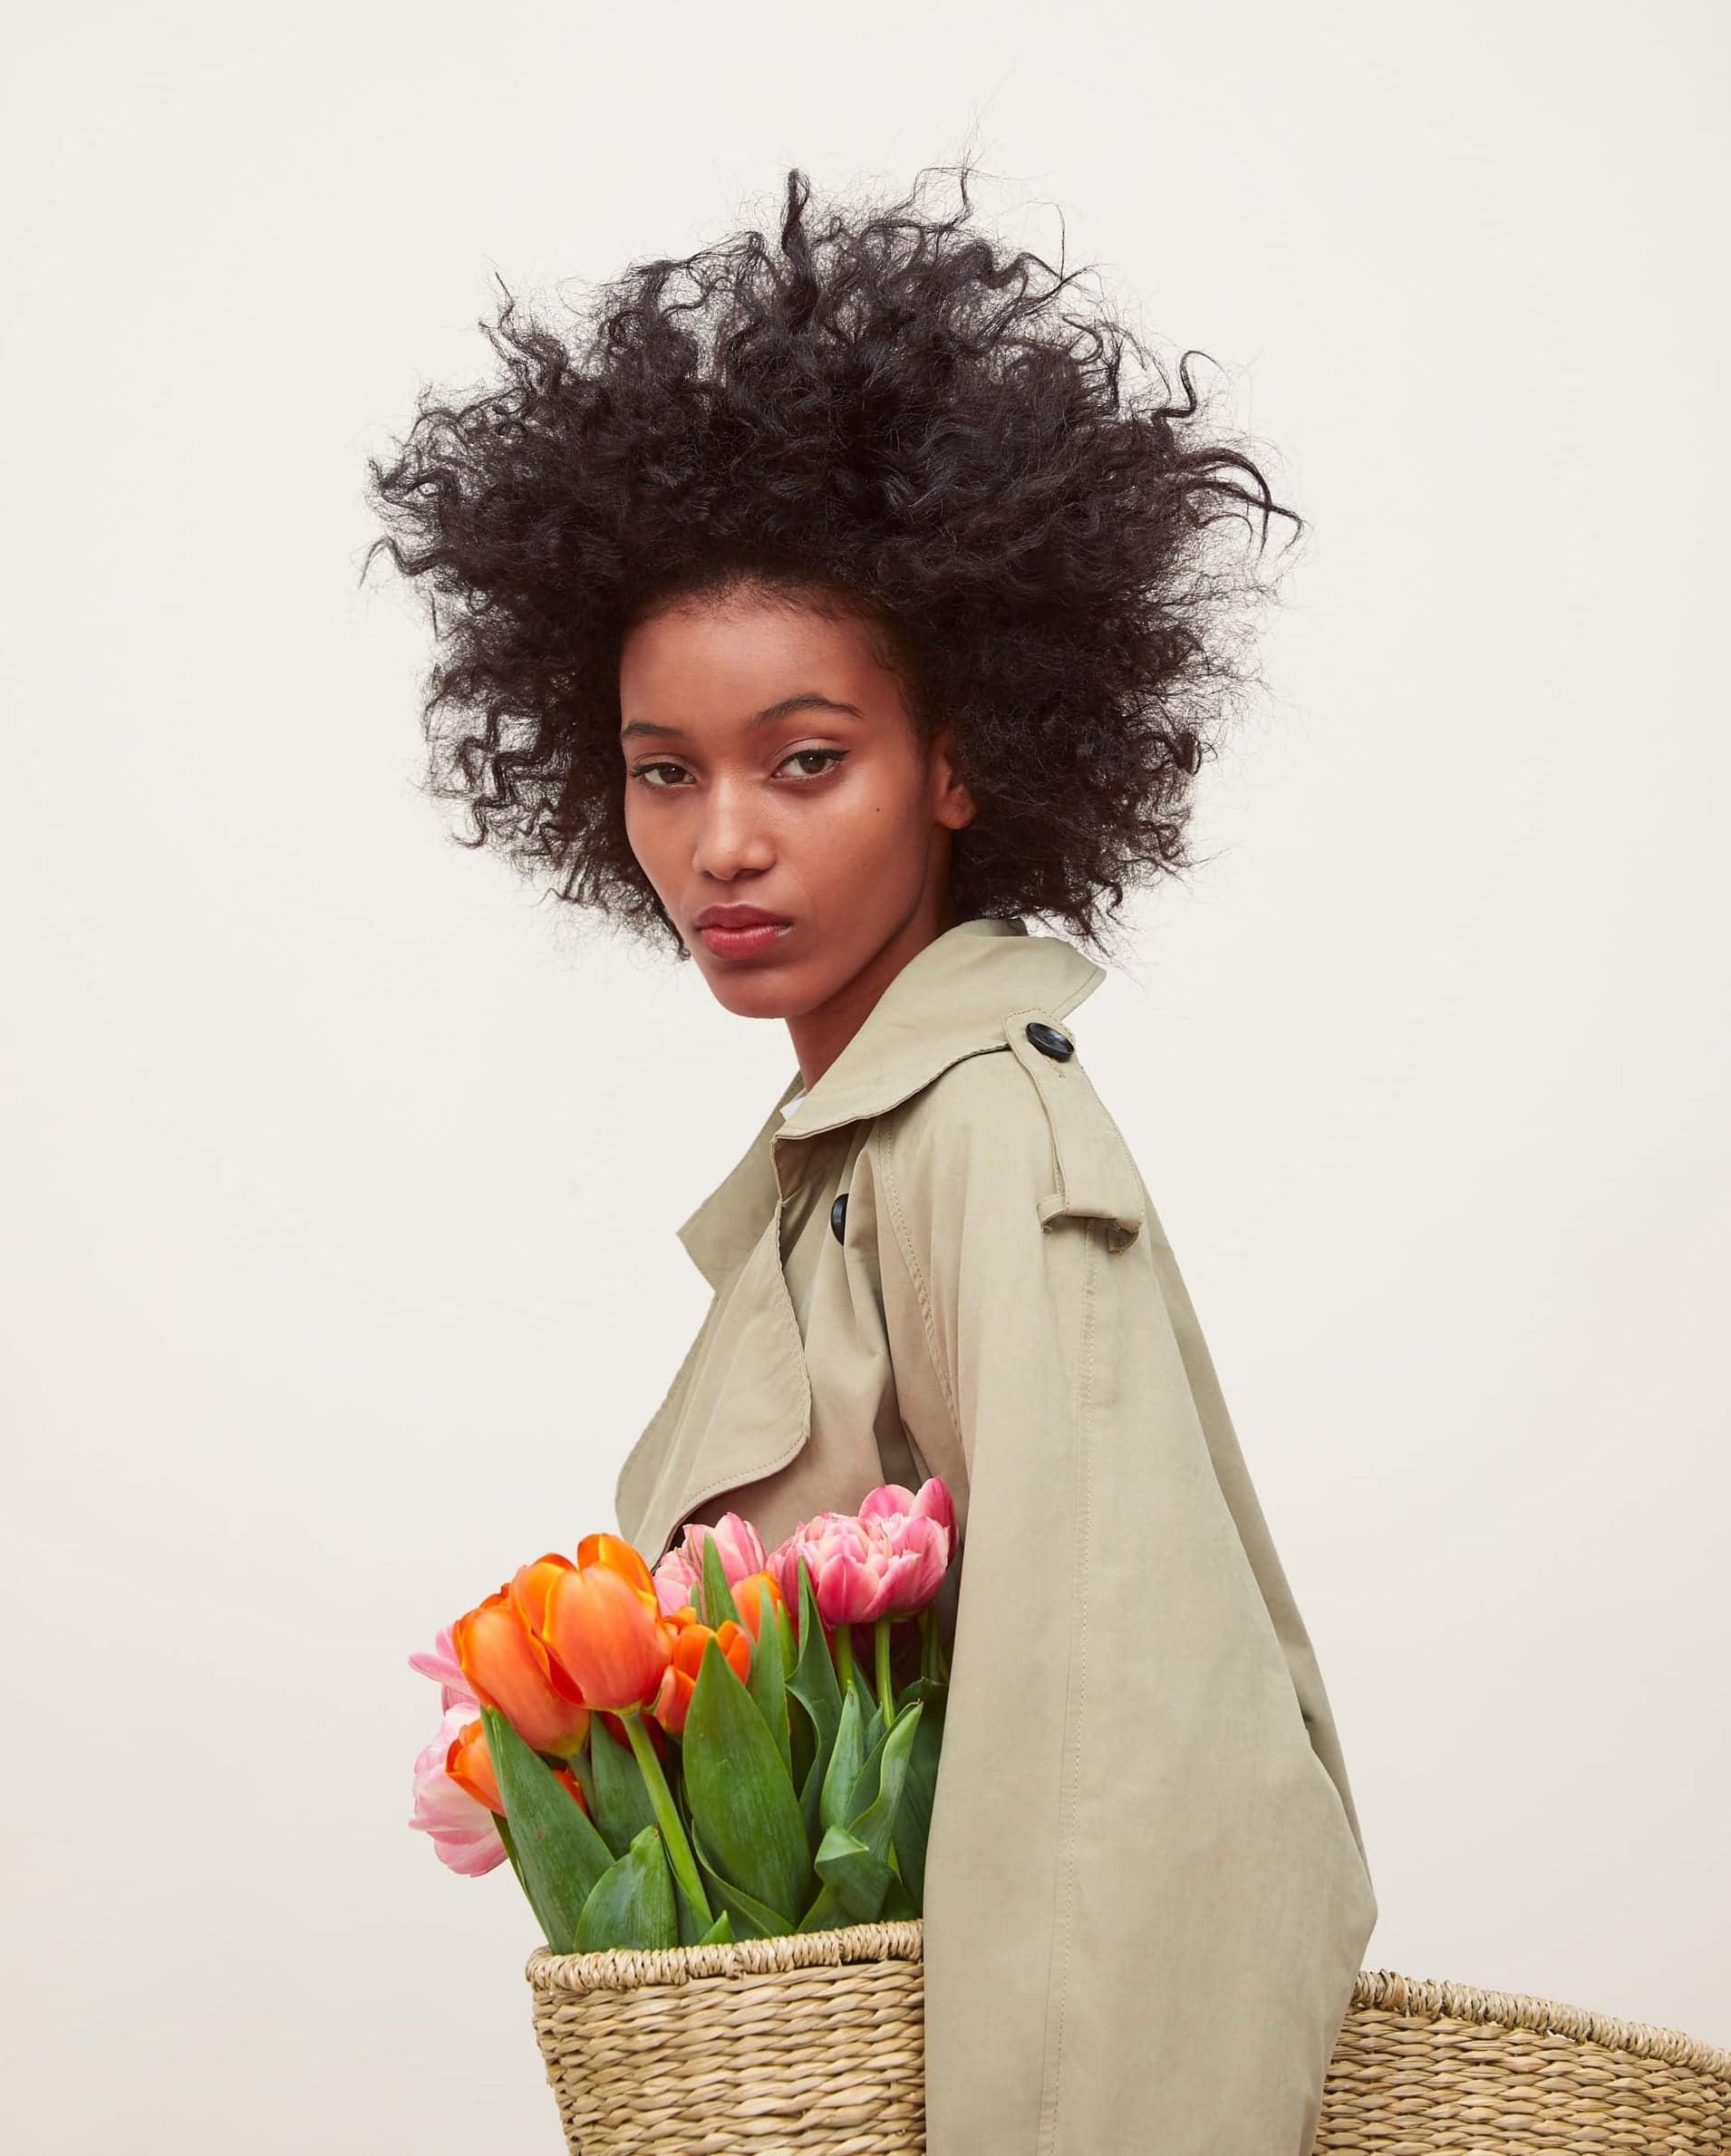 Spring Forward, Sis! Shop These 10 Trench Coats & Handbag Sets For Under $50